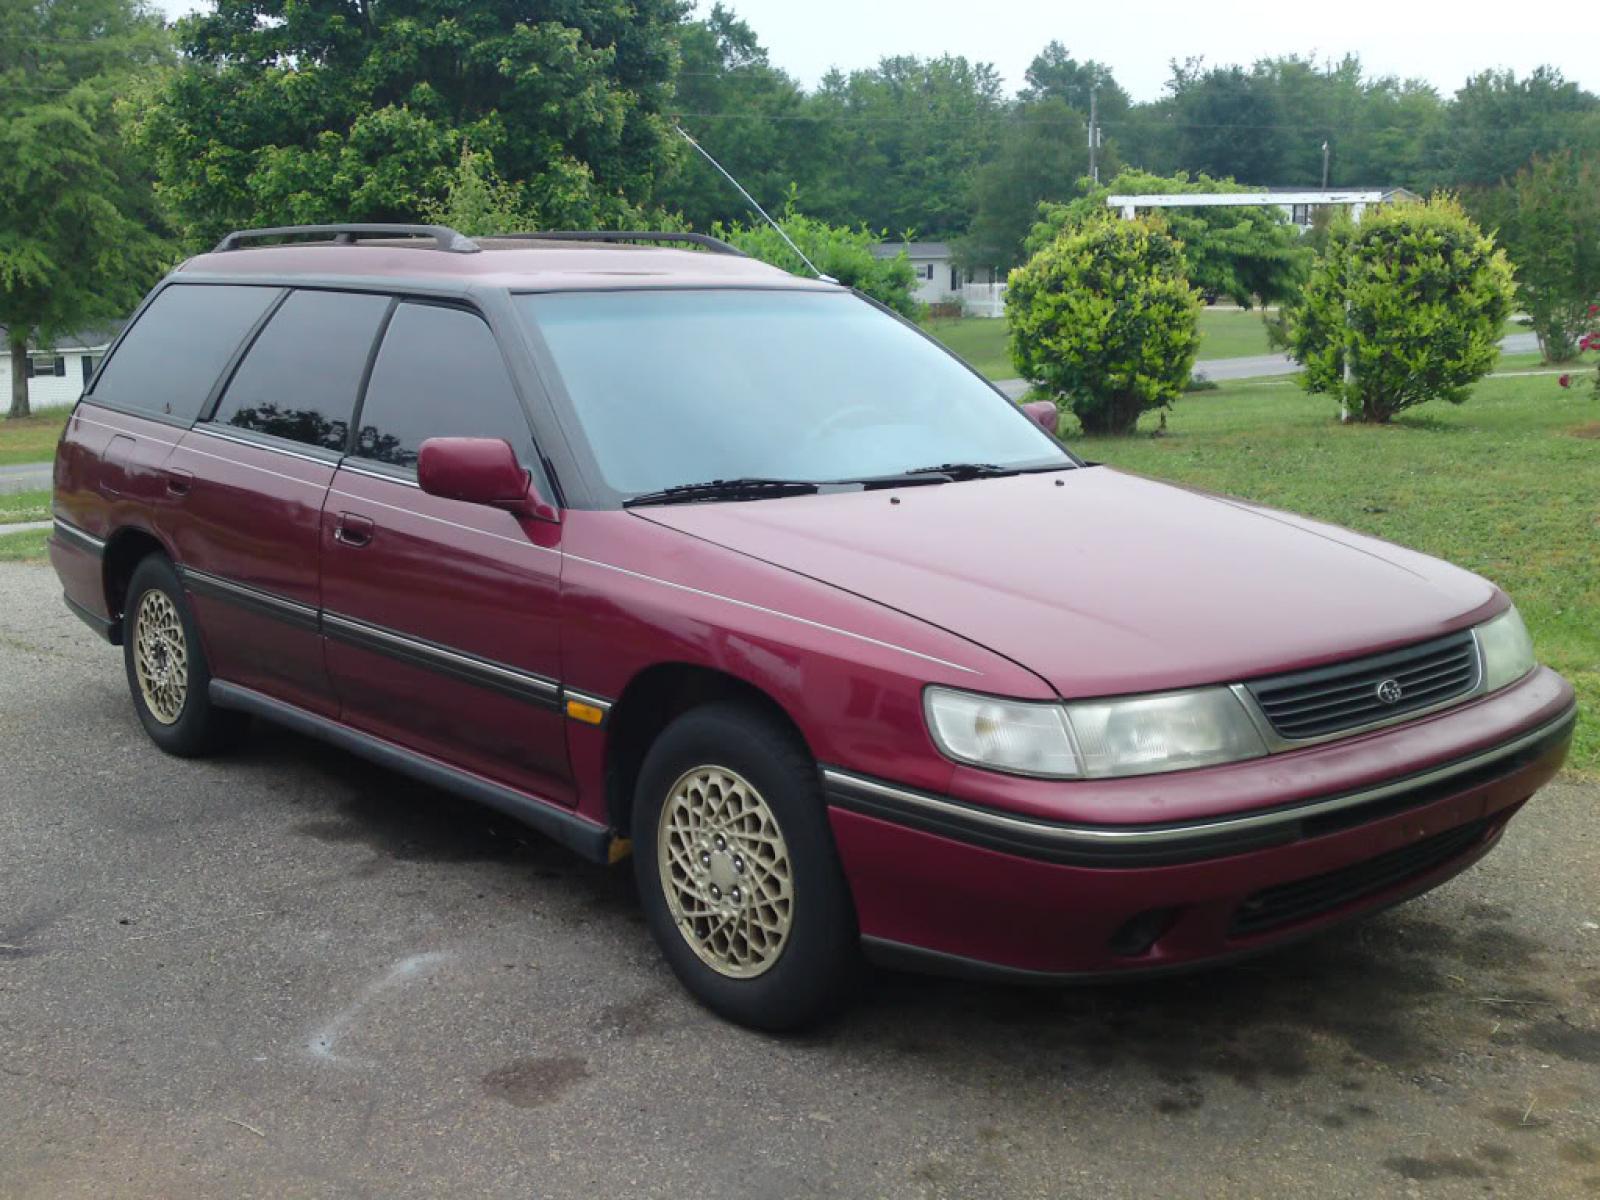 800 1024 1280 1600 origin 1994 Subaru Legacy ...